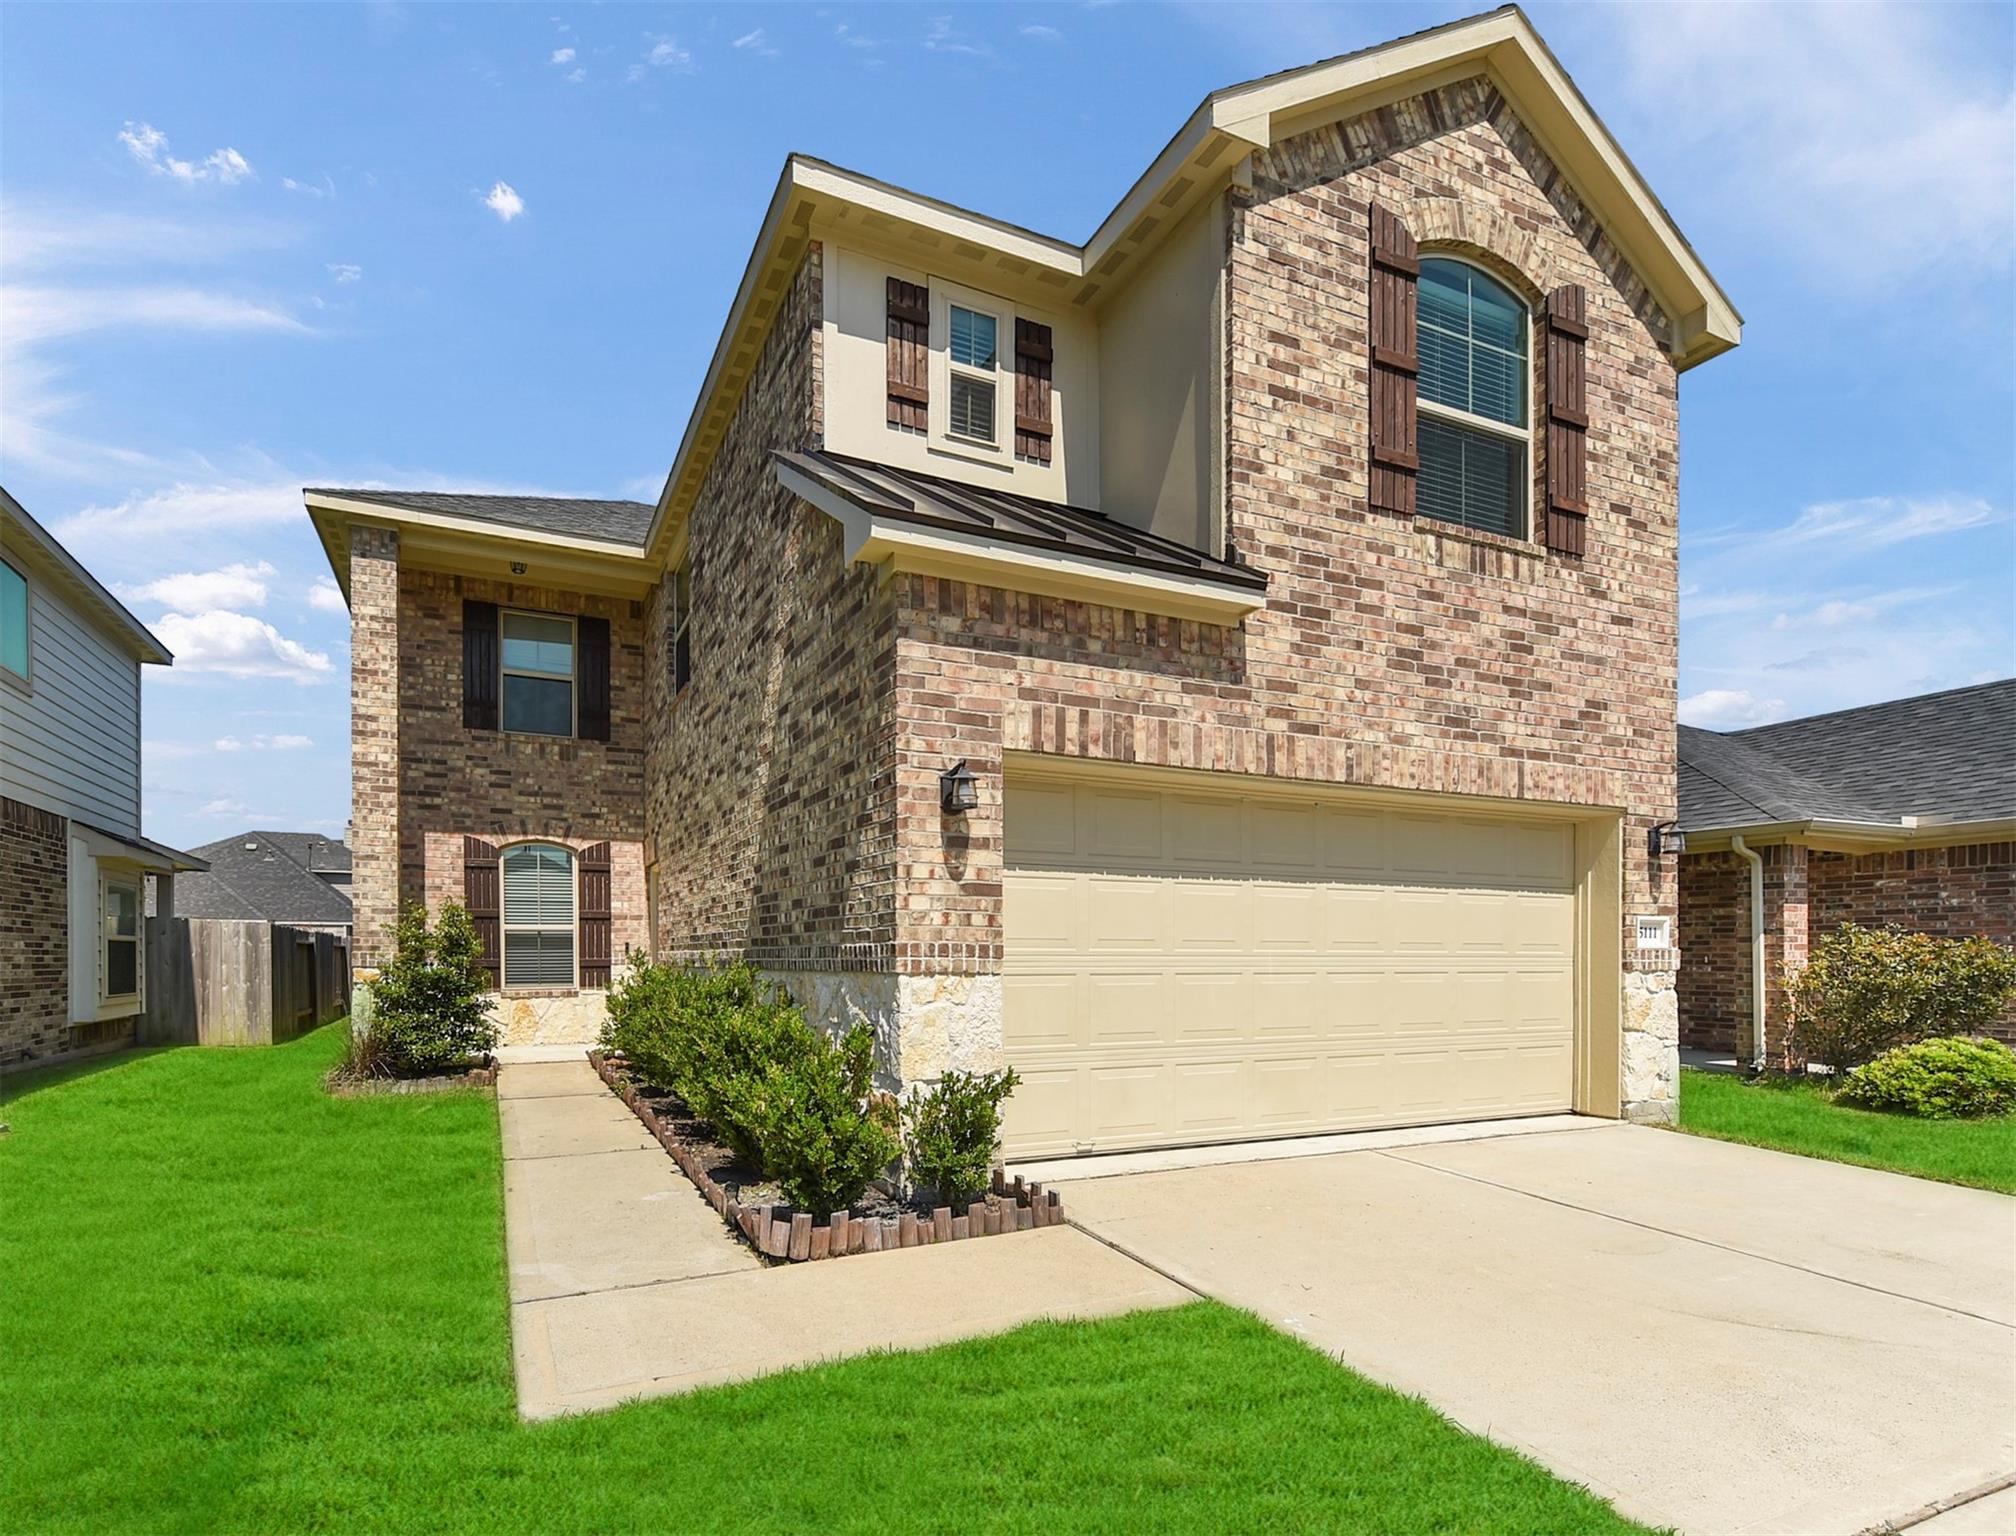 5111 Bay Lane Property Photo - Bacliff, TX real estate listing